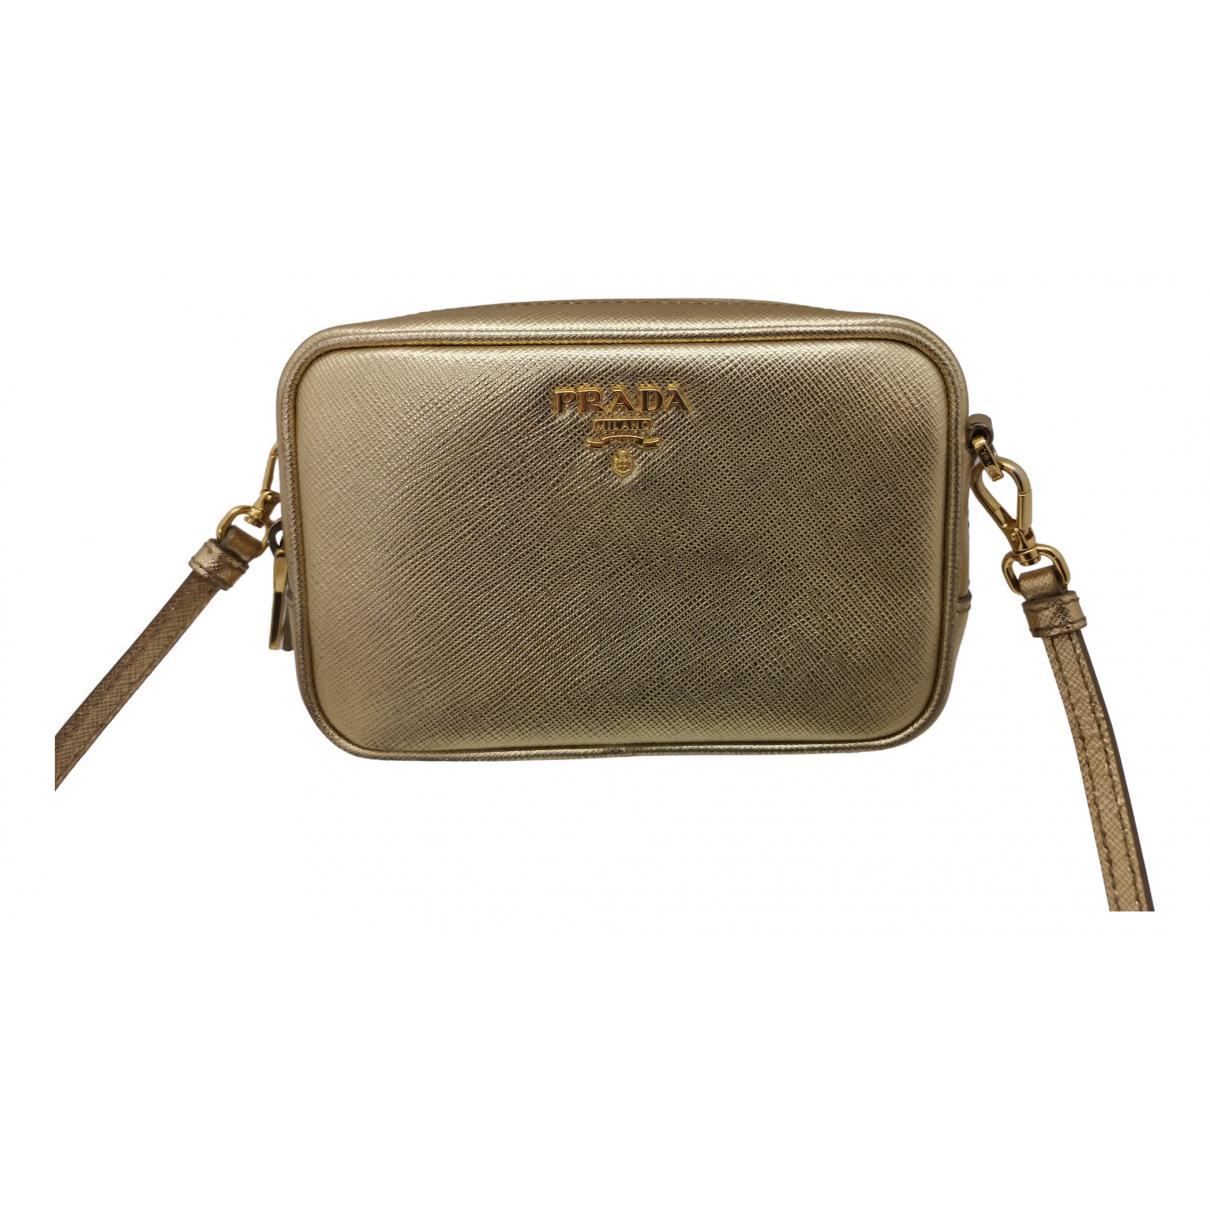 Prada Galleria Gold Leather handbag for Women N